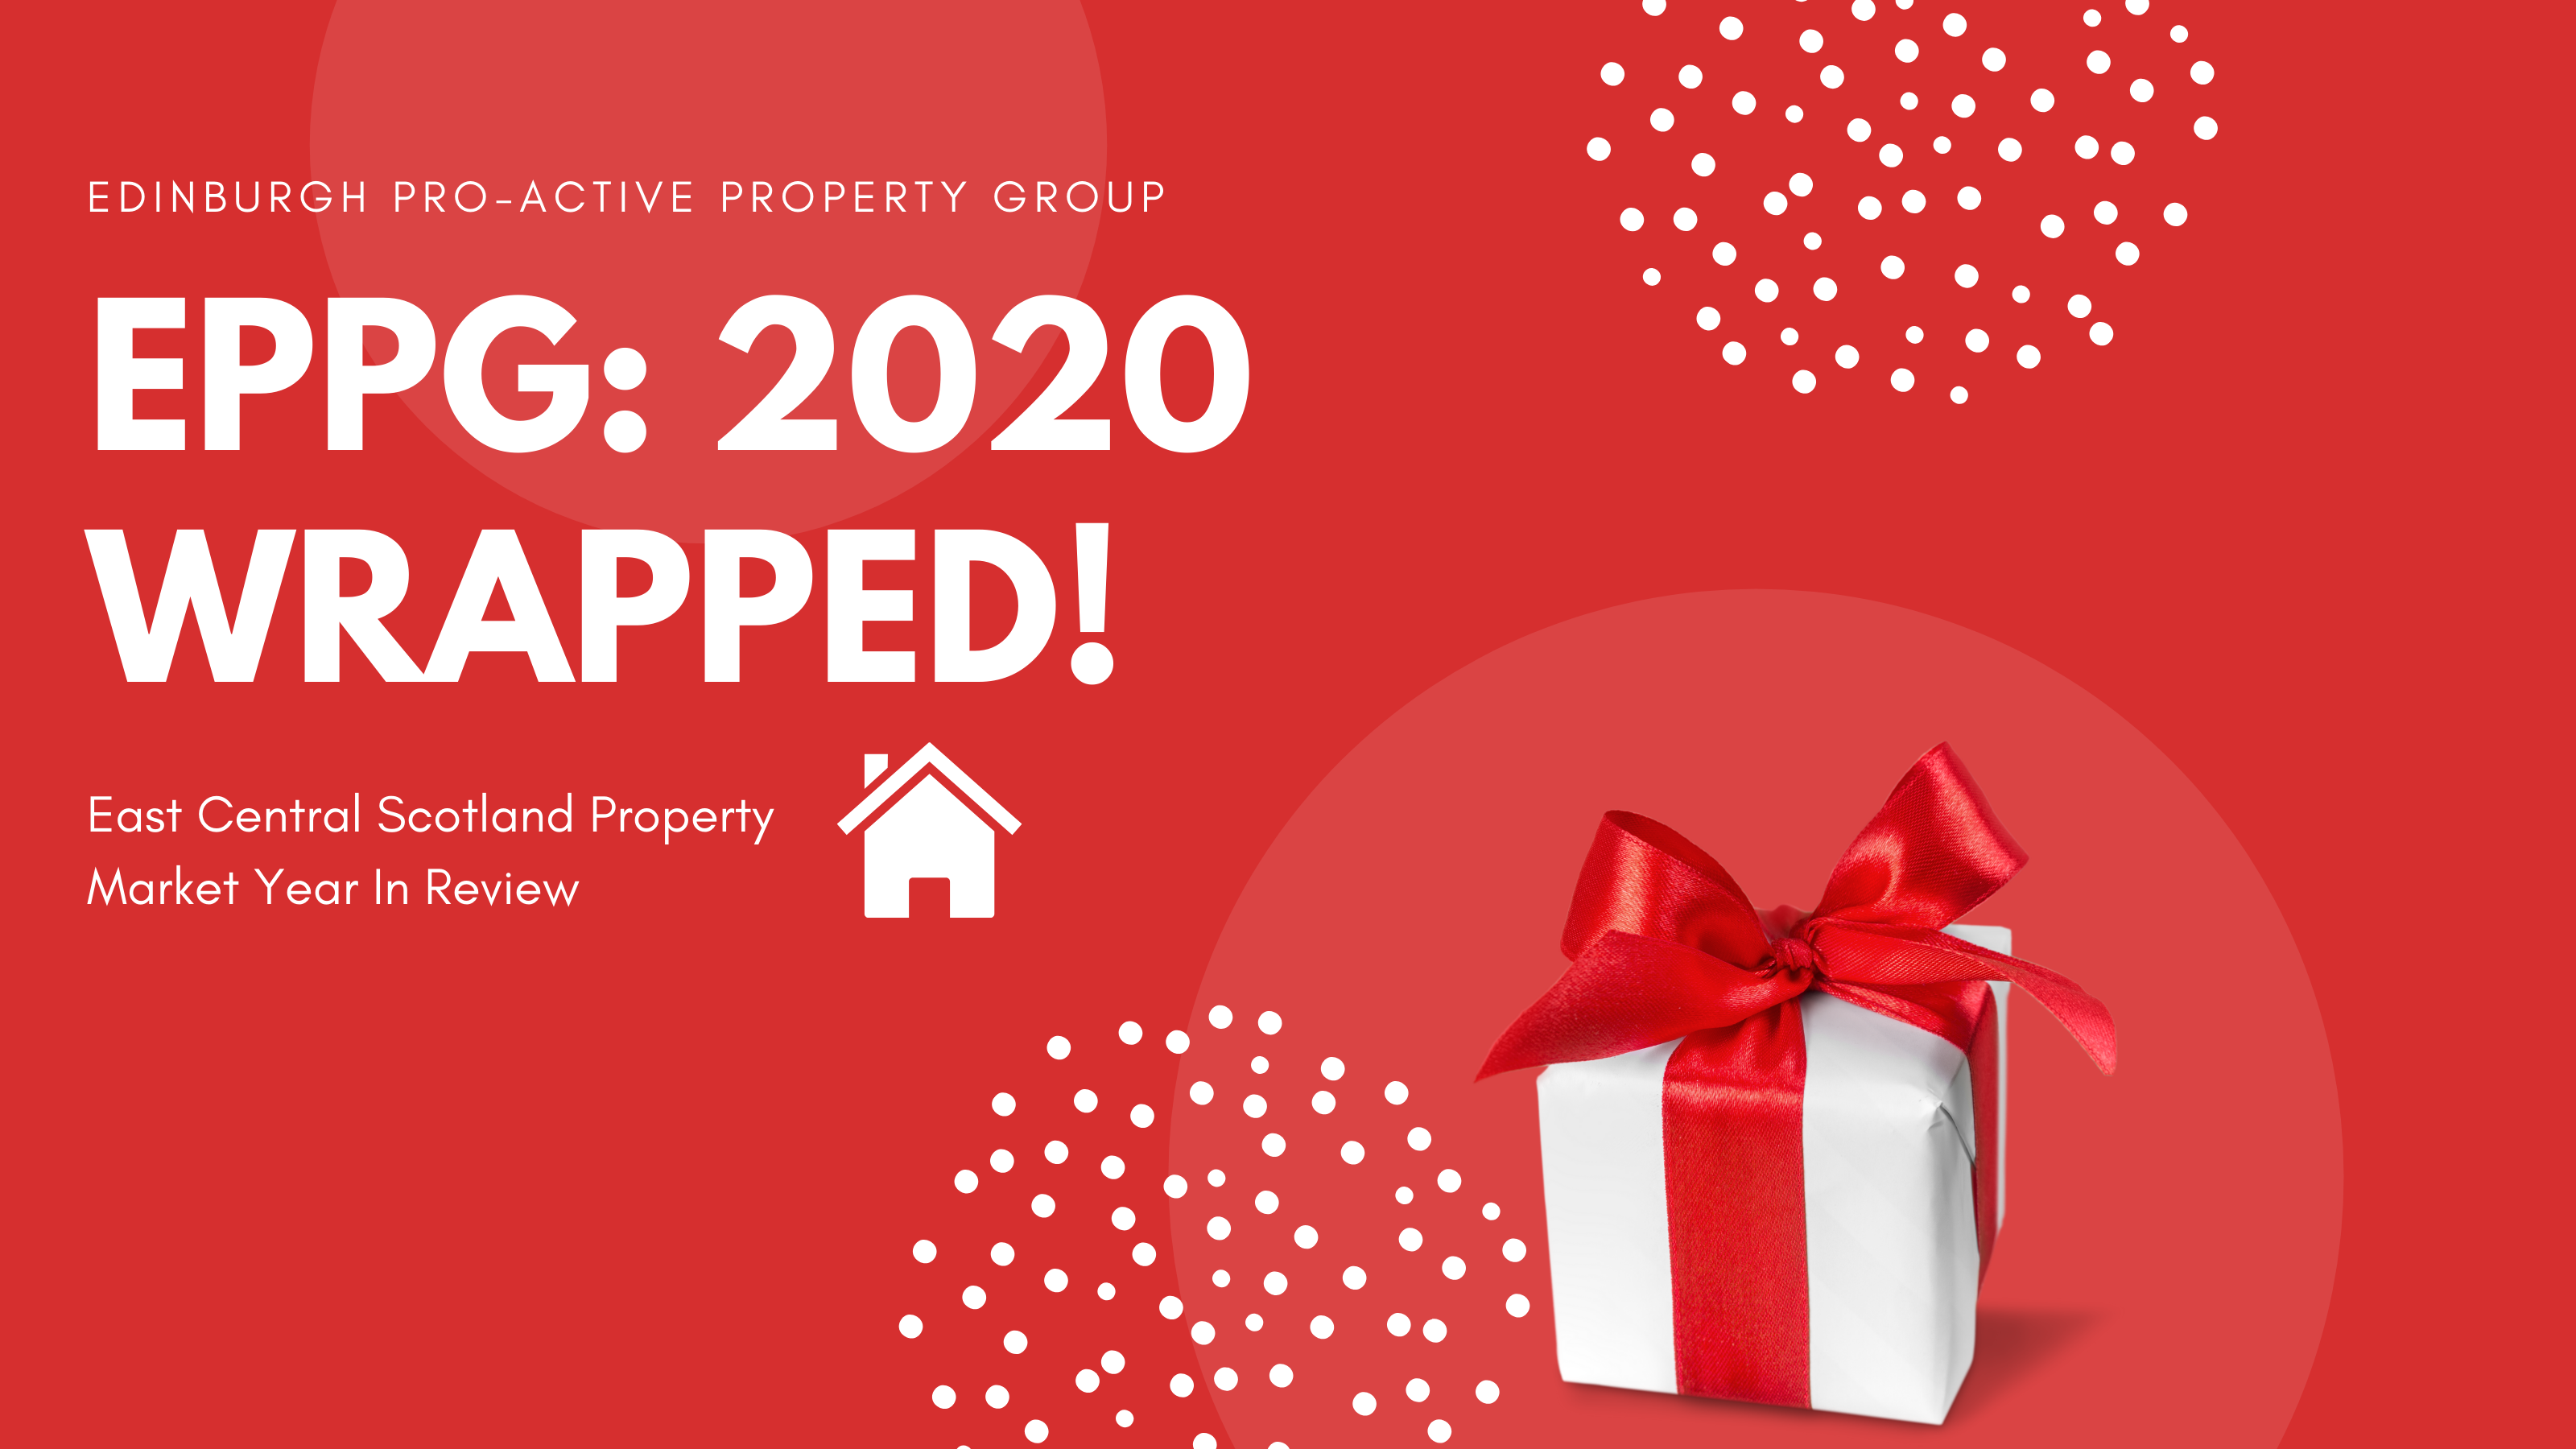 Edinburgh Pro-Active Property Group 2020